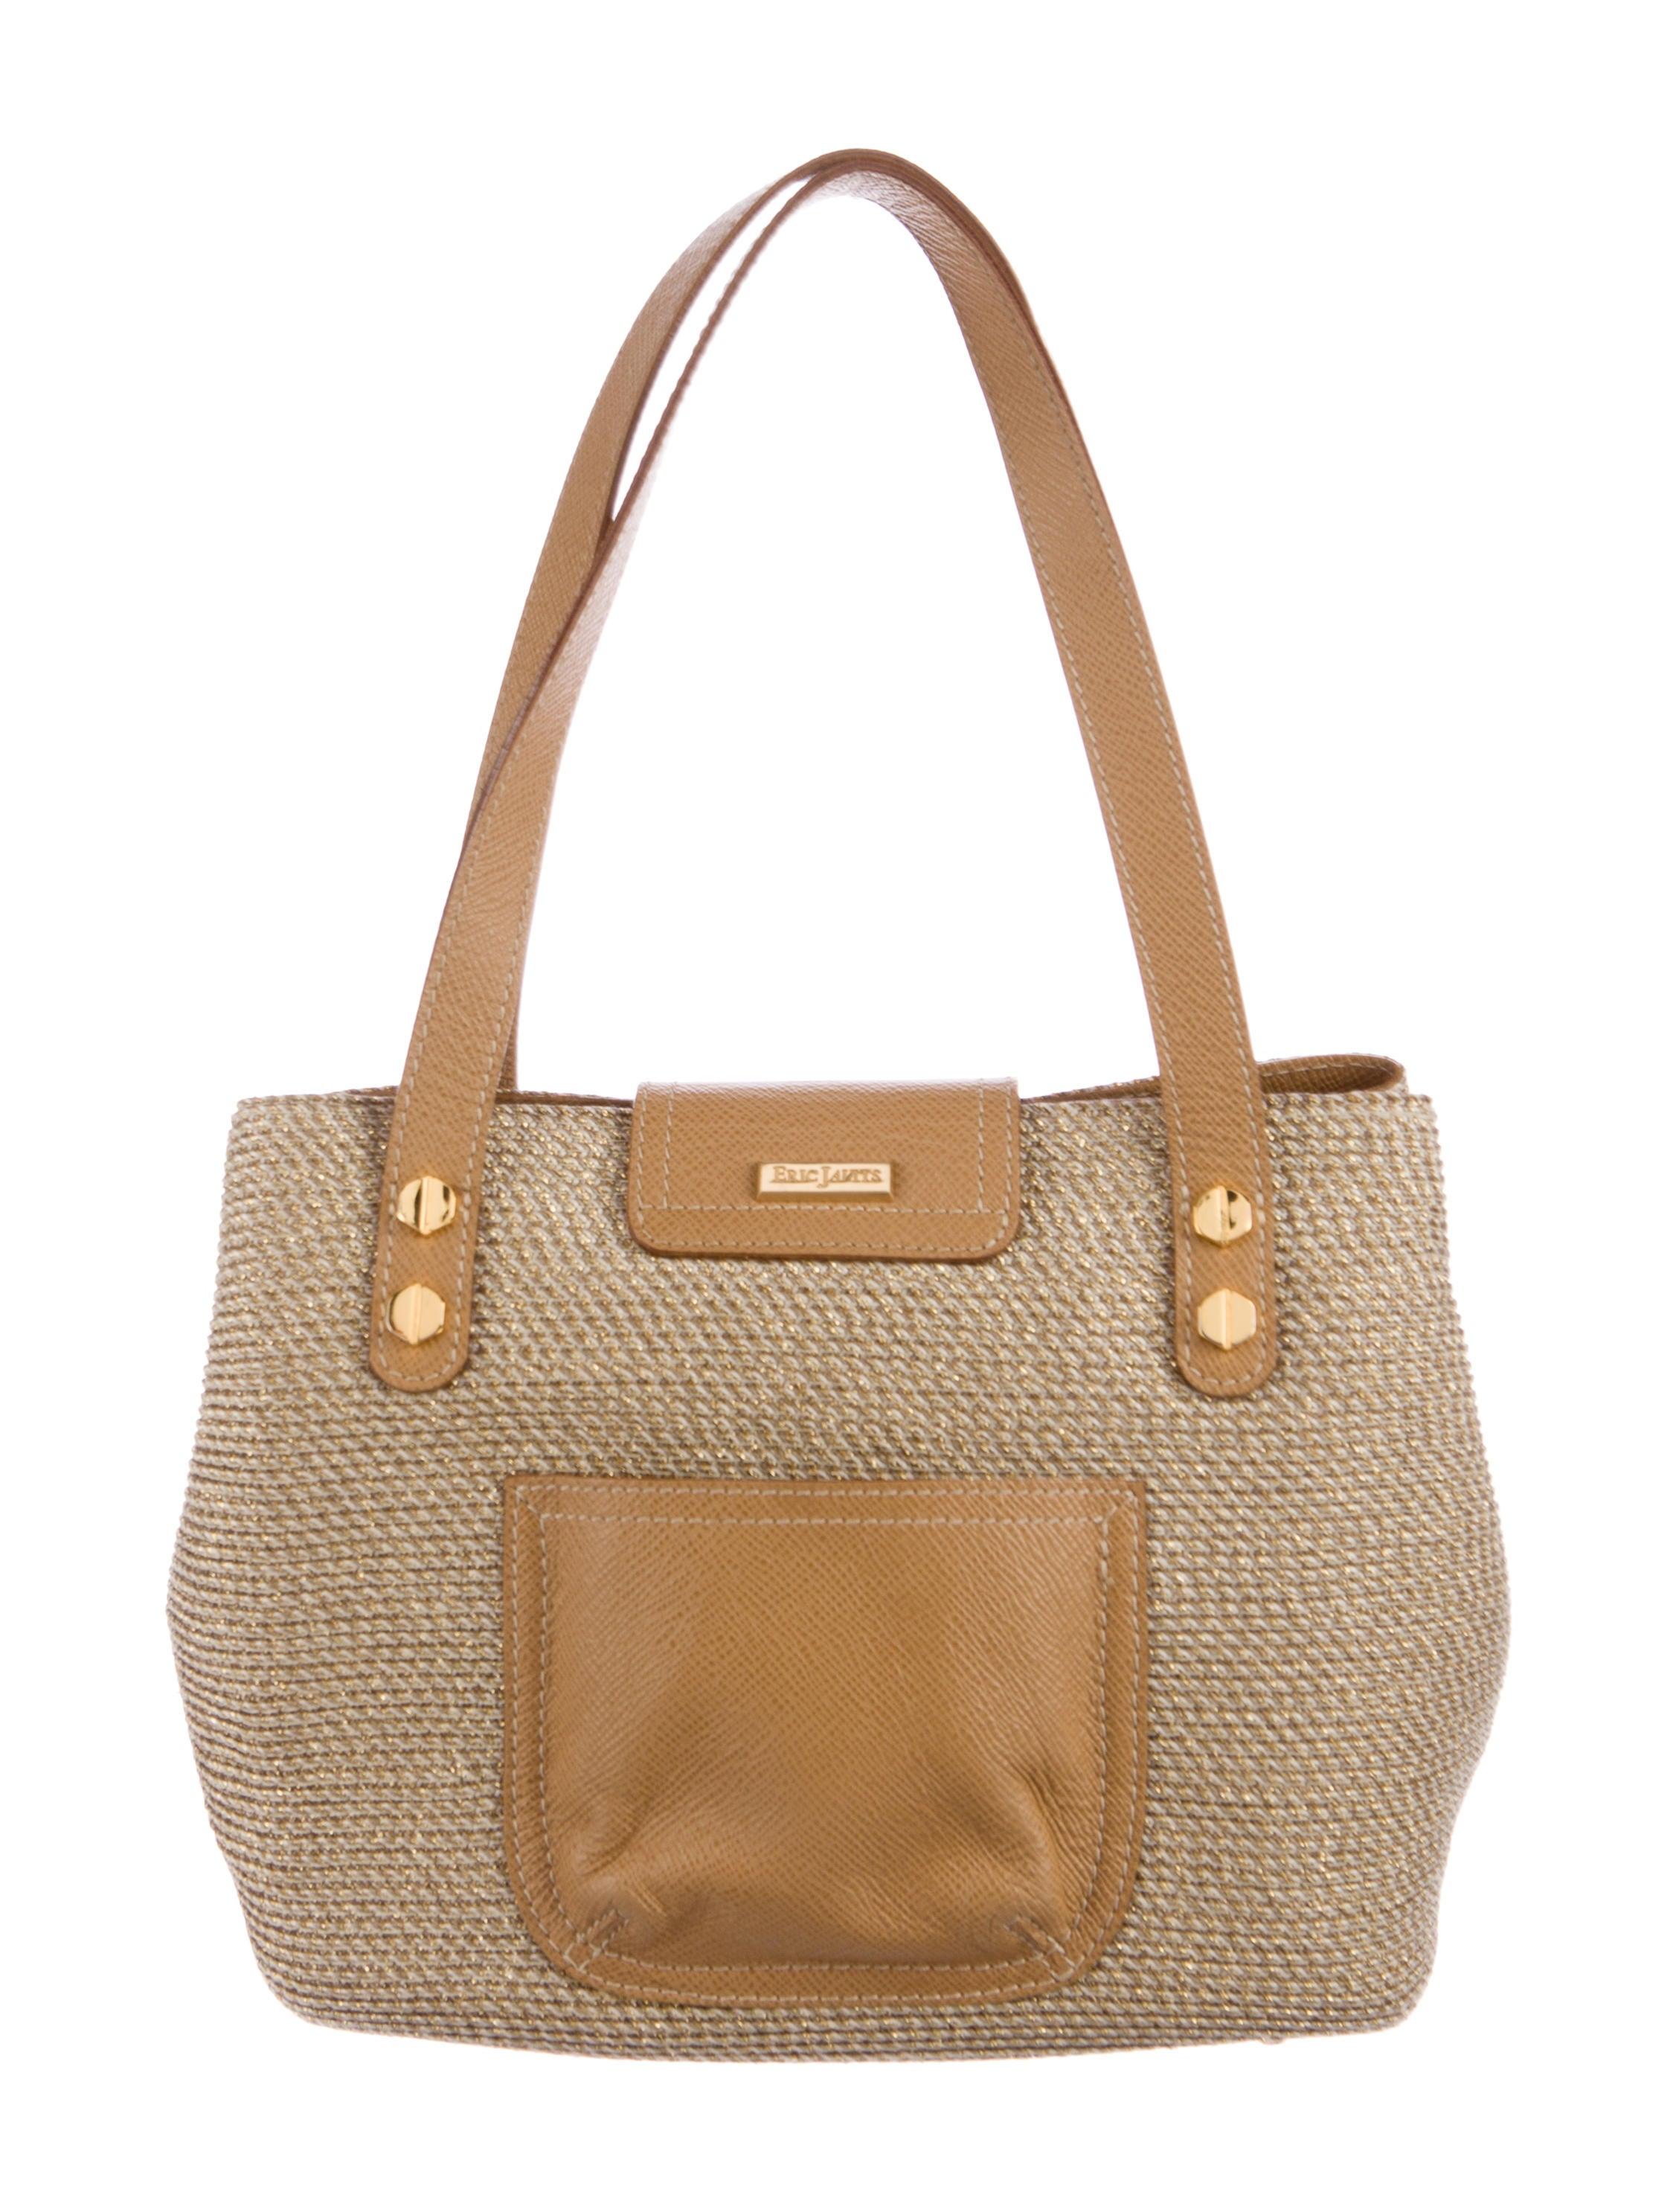 Eric Javits Metallic Straw Bag Handbags Wej20102 The